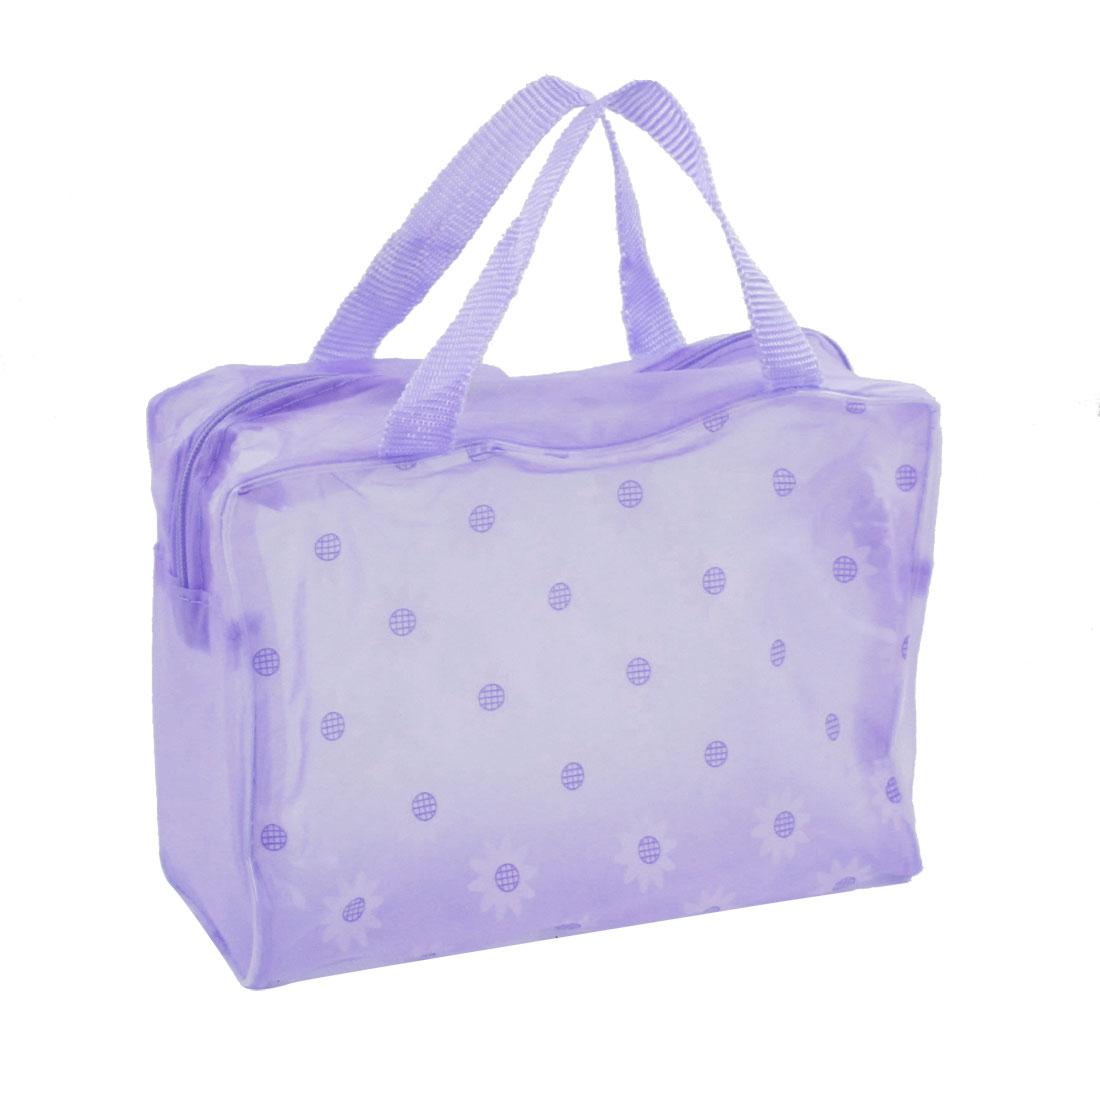 Portable Light Purple Sunflower Pattern Translucent Shower Bag for Bathroom